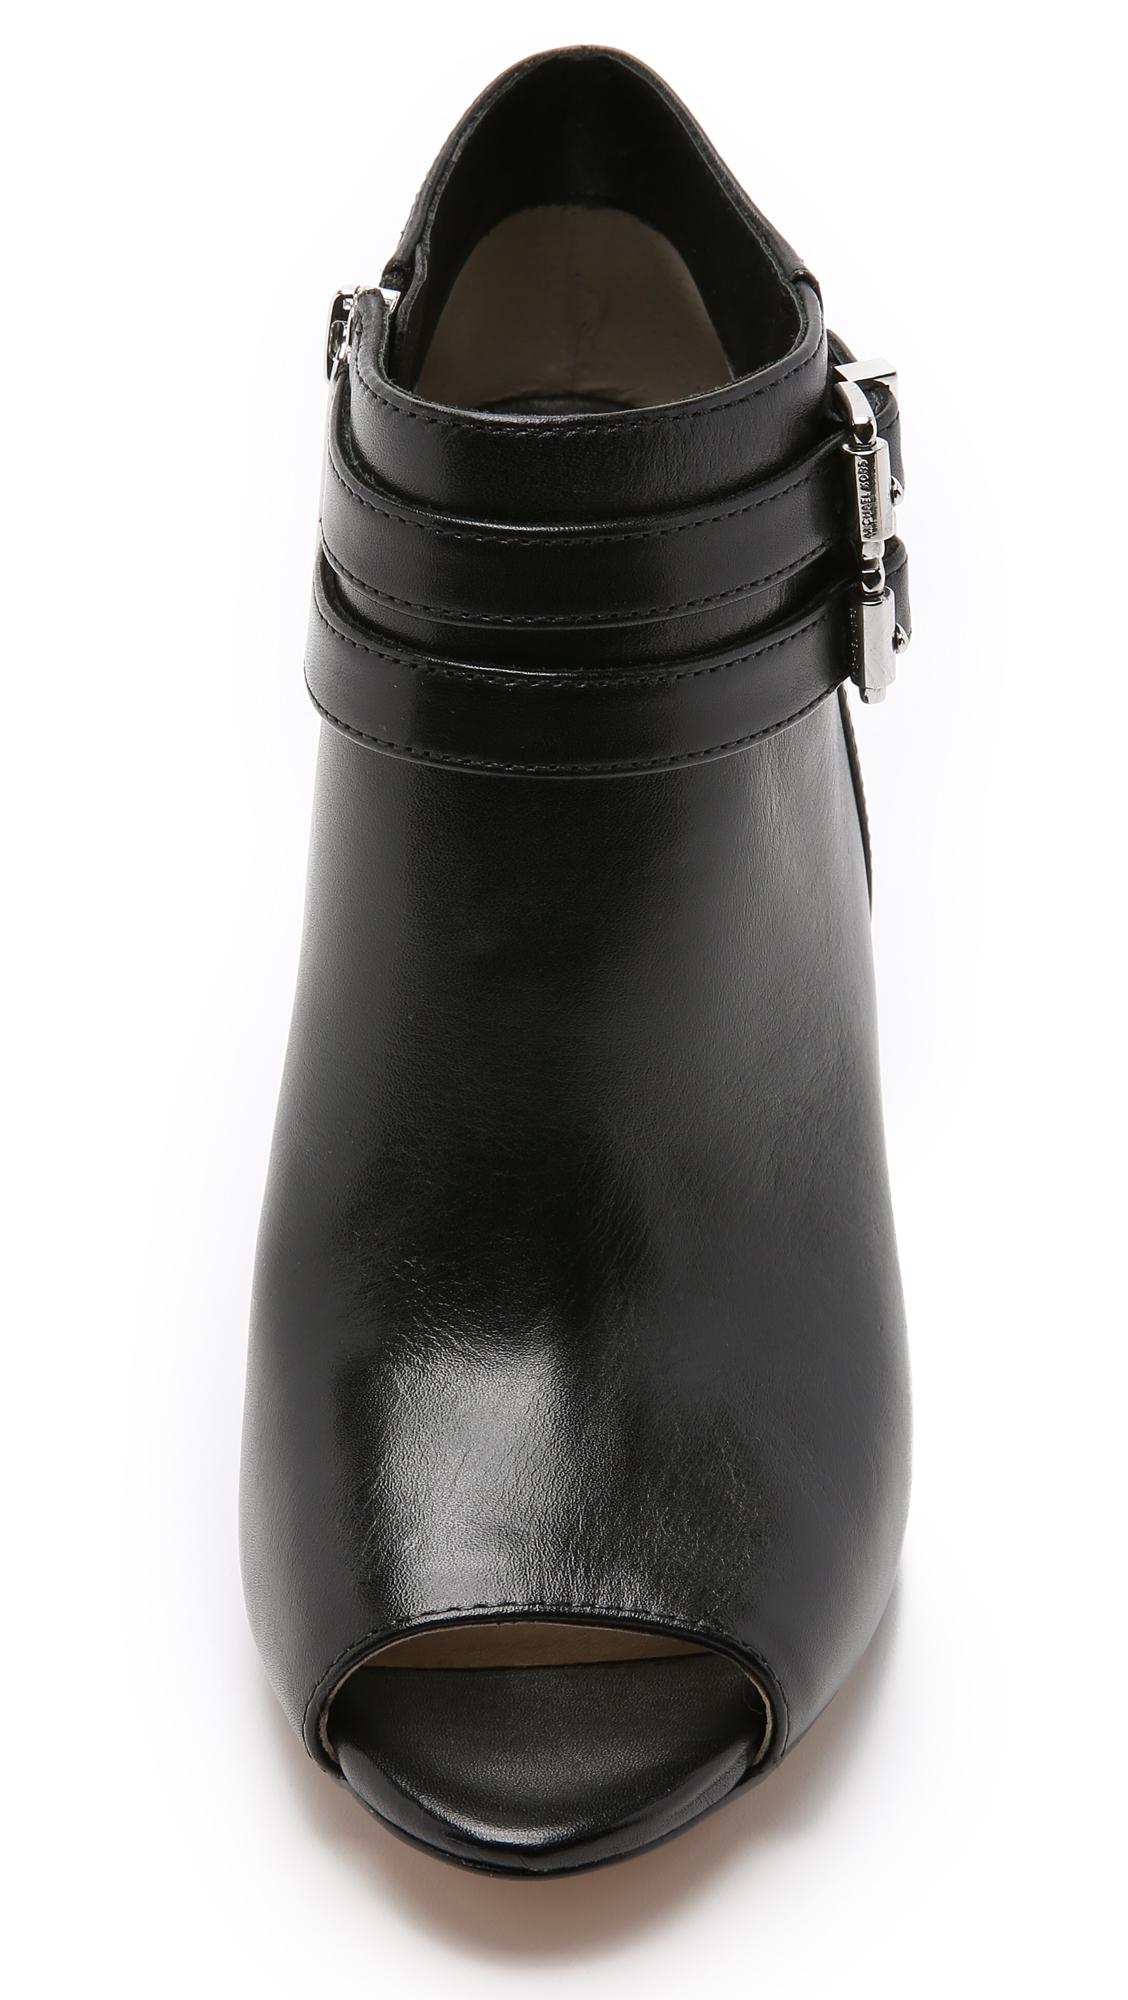 MICHAEL Michael Kors Saylor Peep Toe Booties - Black